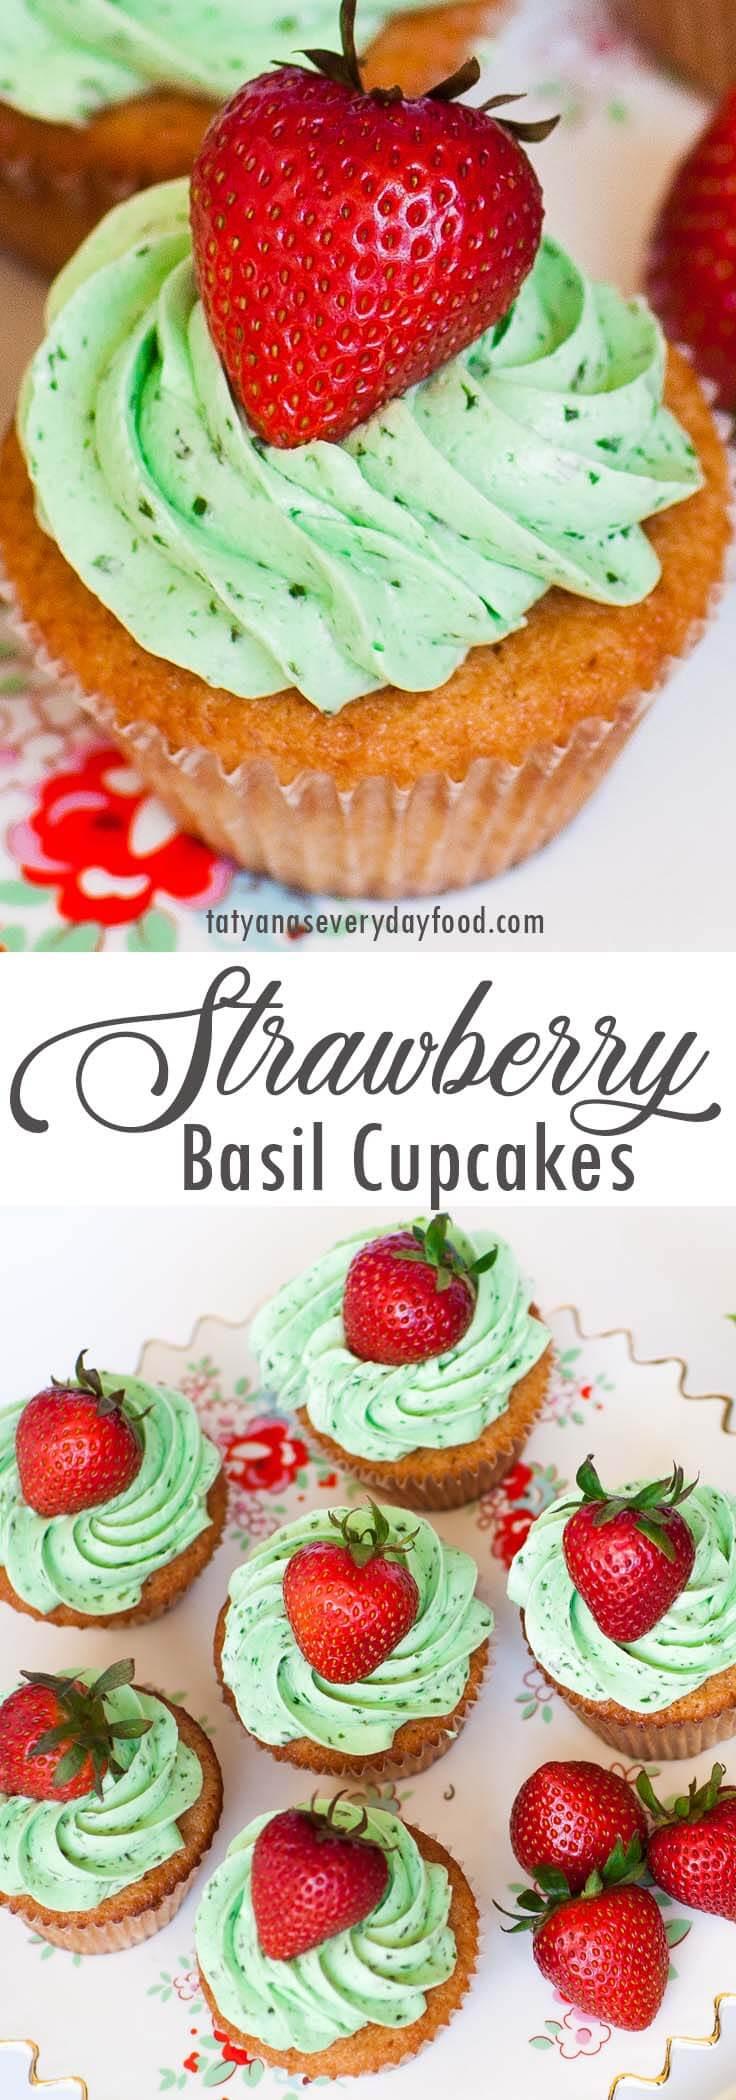 Strawberry Basil Cupcakes video recipe